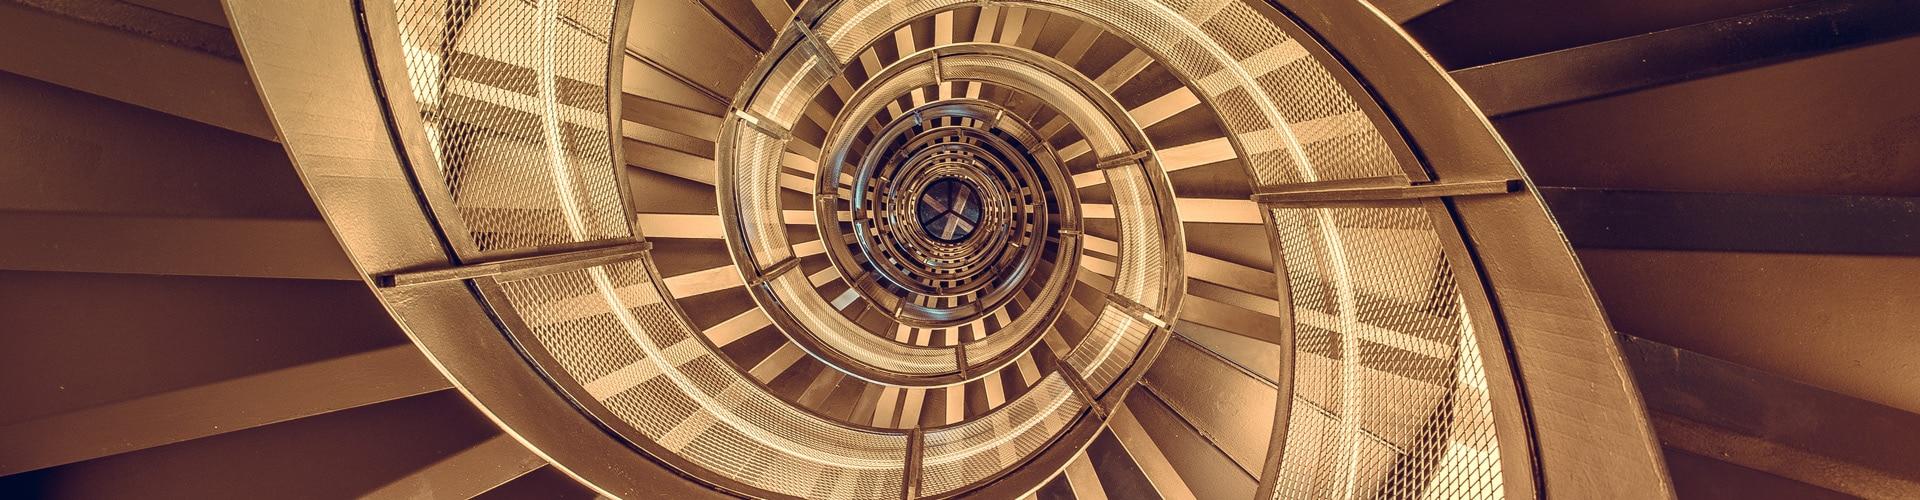 Per Hypnose abnehmen? HAMBURG ZWEI wagt das Experiment! Foto: Shutterstock